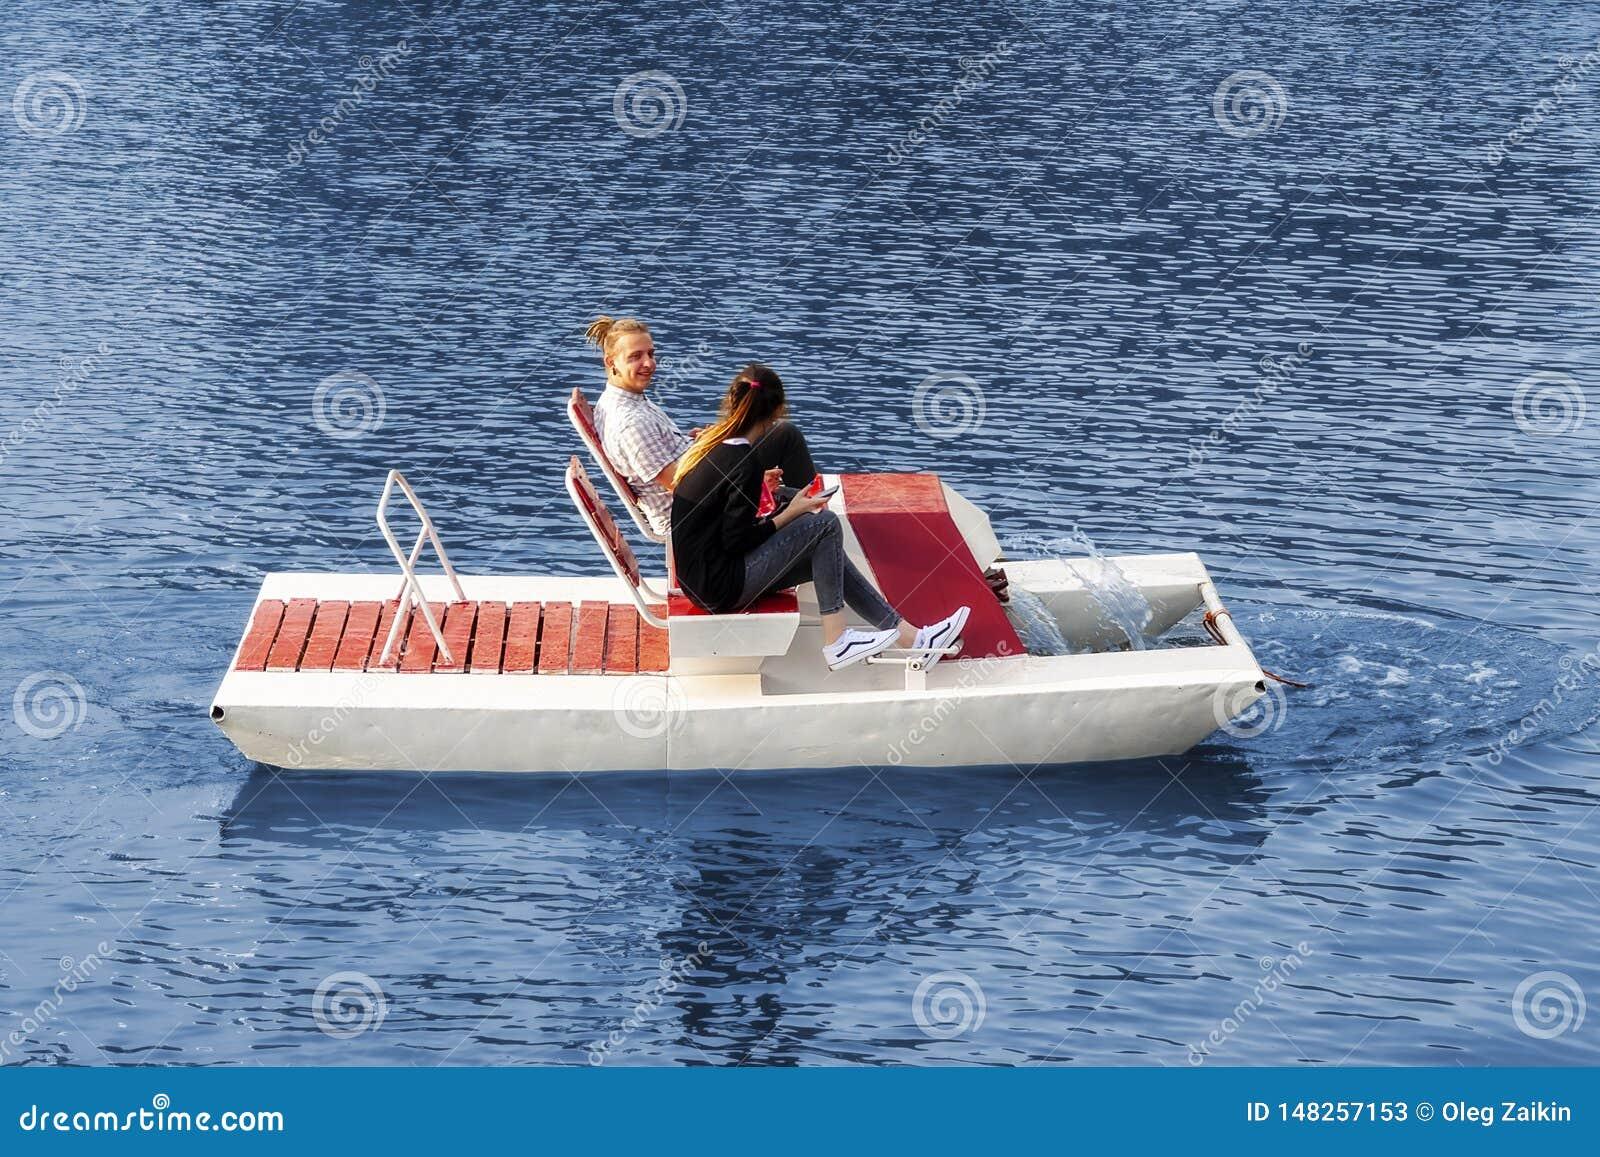 Kaliningrad Russia 05.01.2019 Young couple riding a catamaran